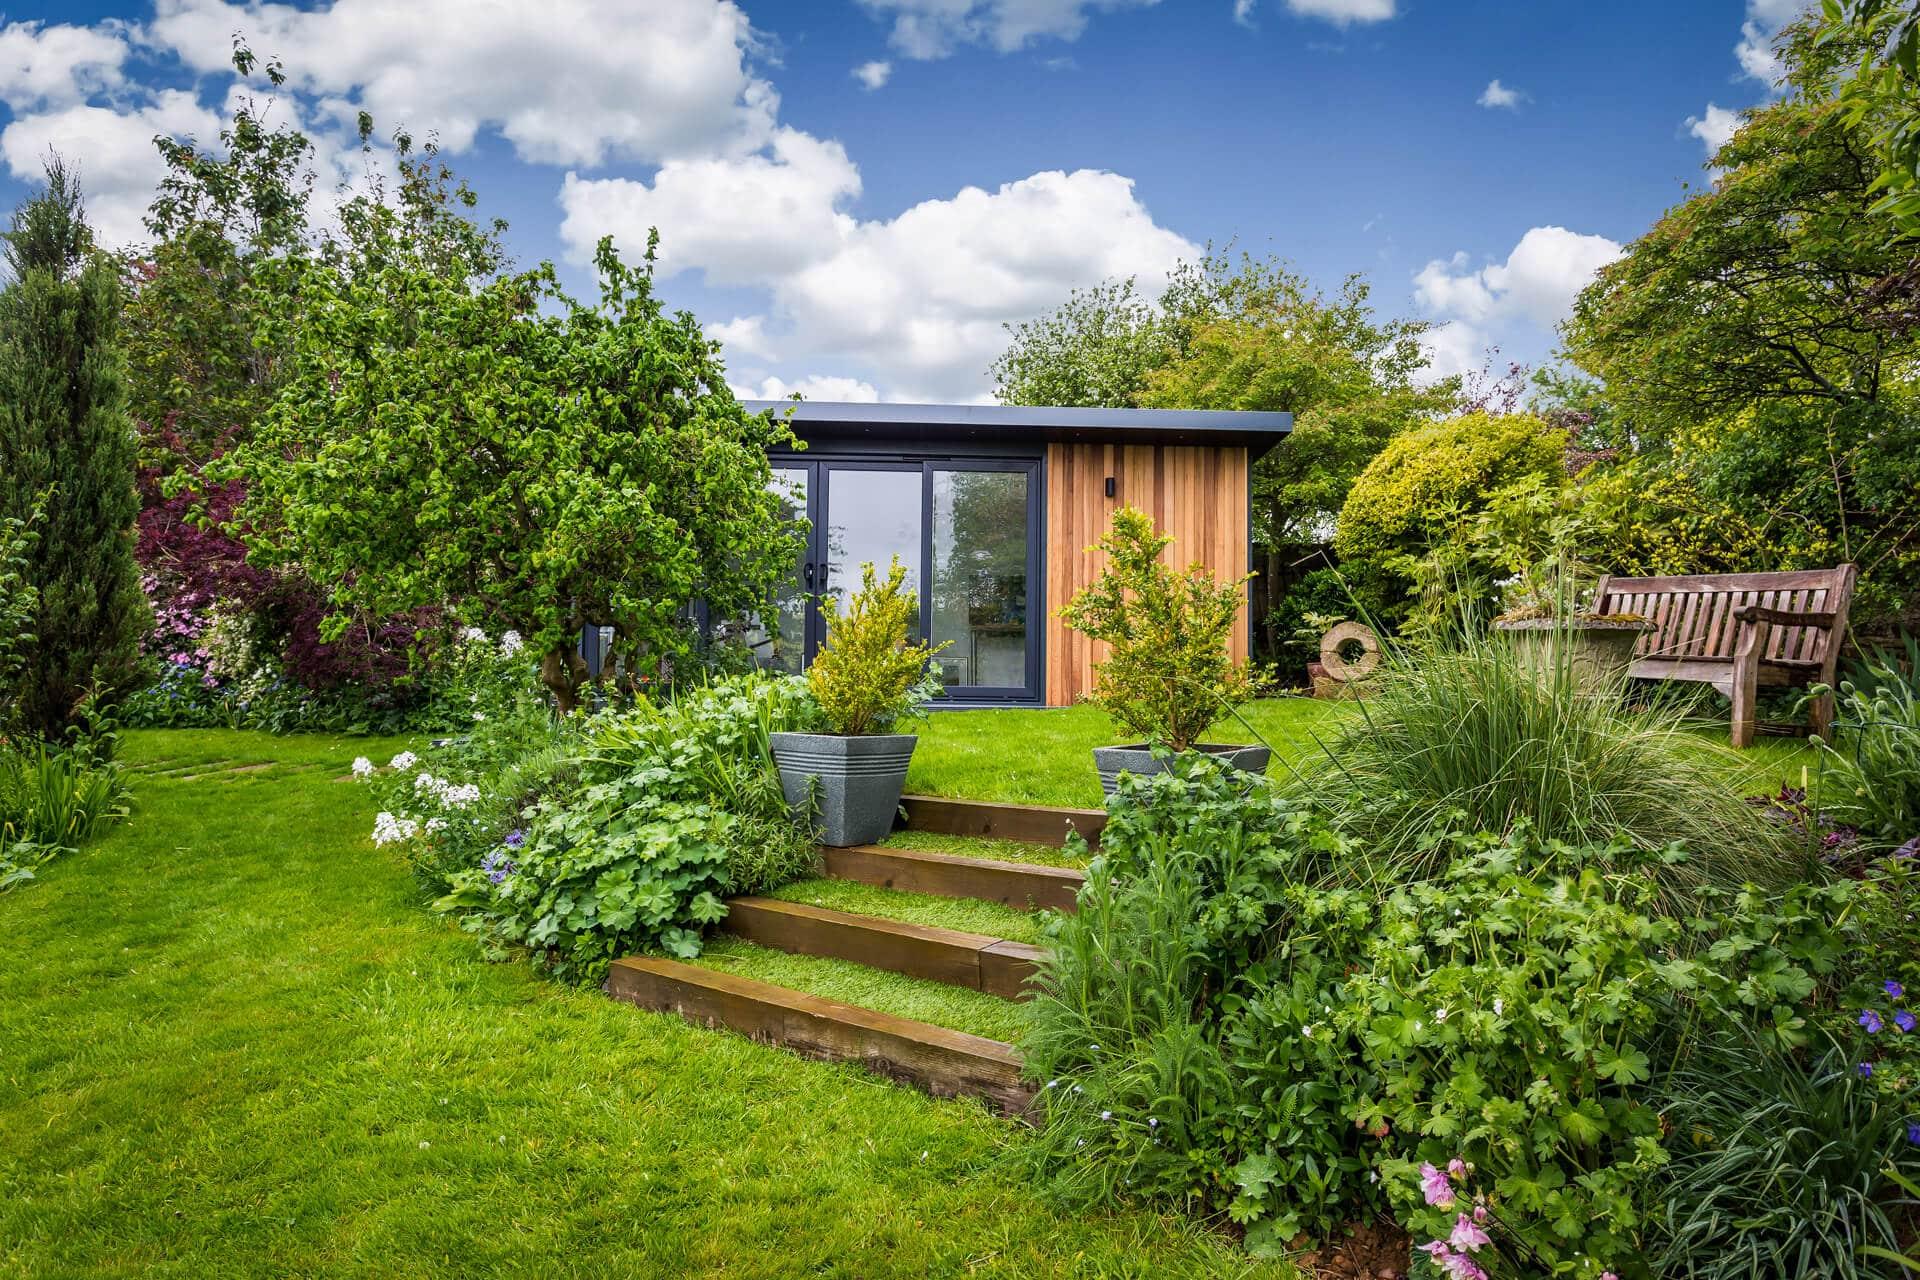 Exterior view of cedar clad garden room located in lush green garden with mature shrubs